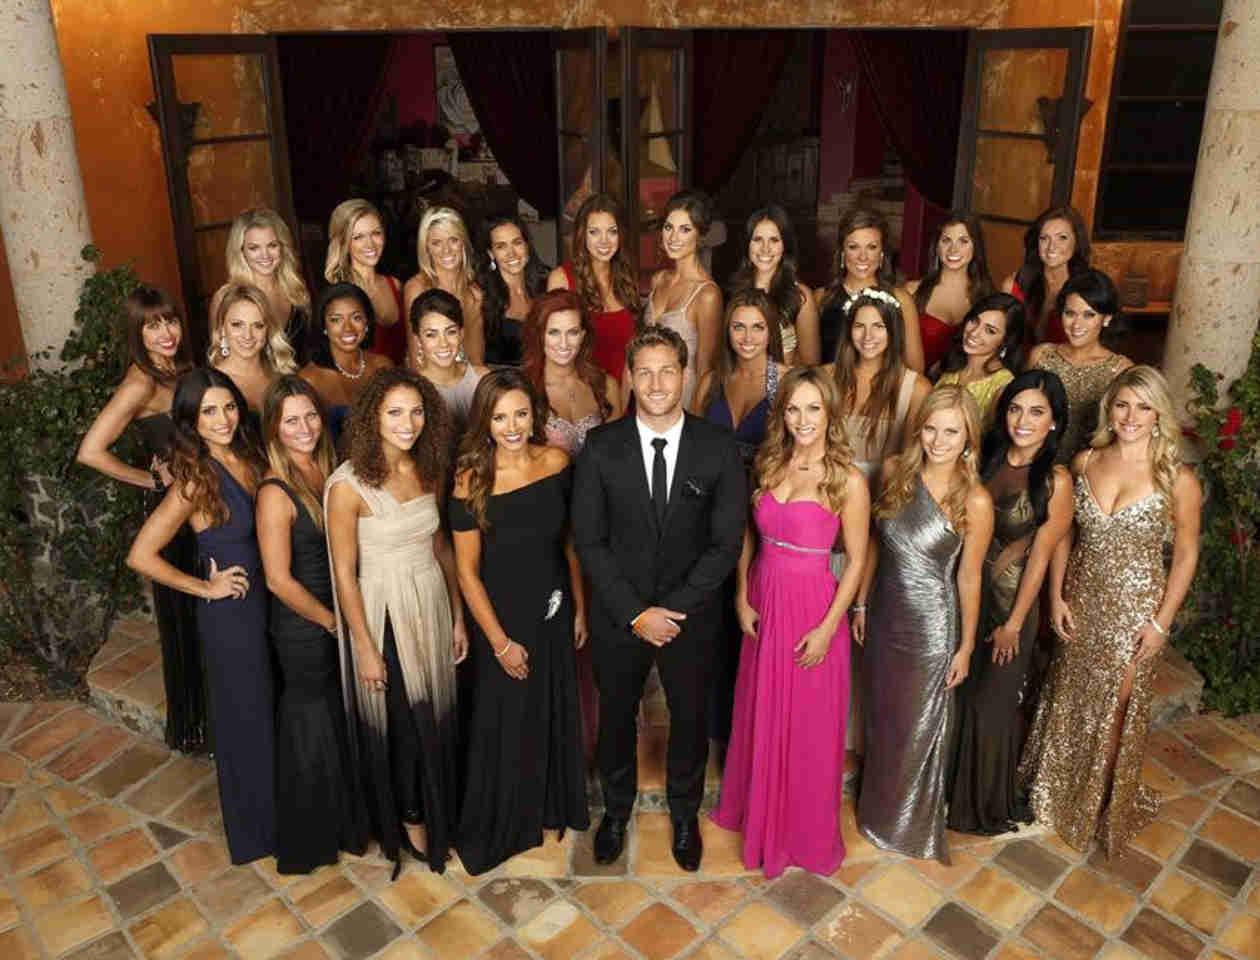 Bachelor 2014: Who Are Juan Pablo Galavis' Final Six Girls?